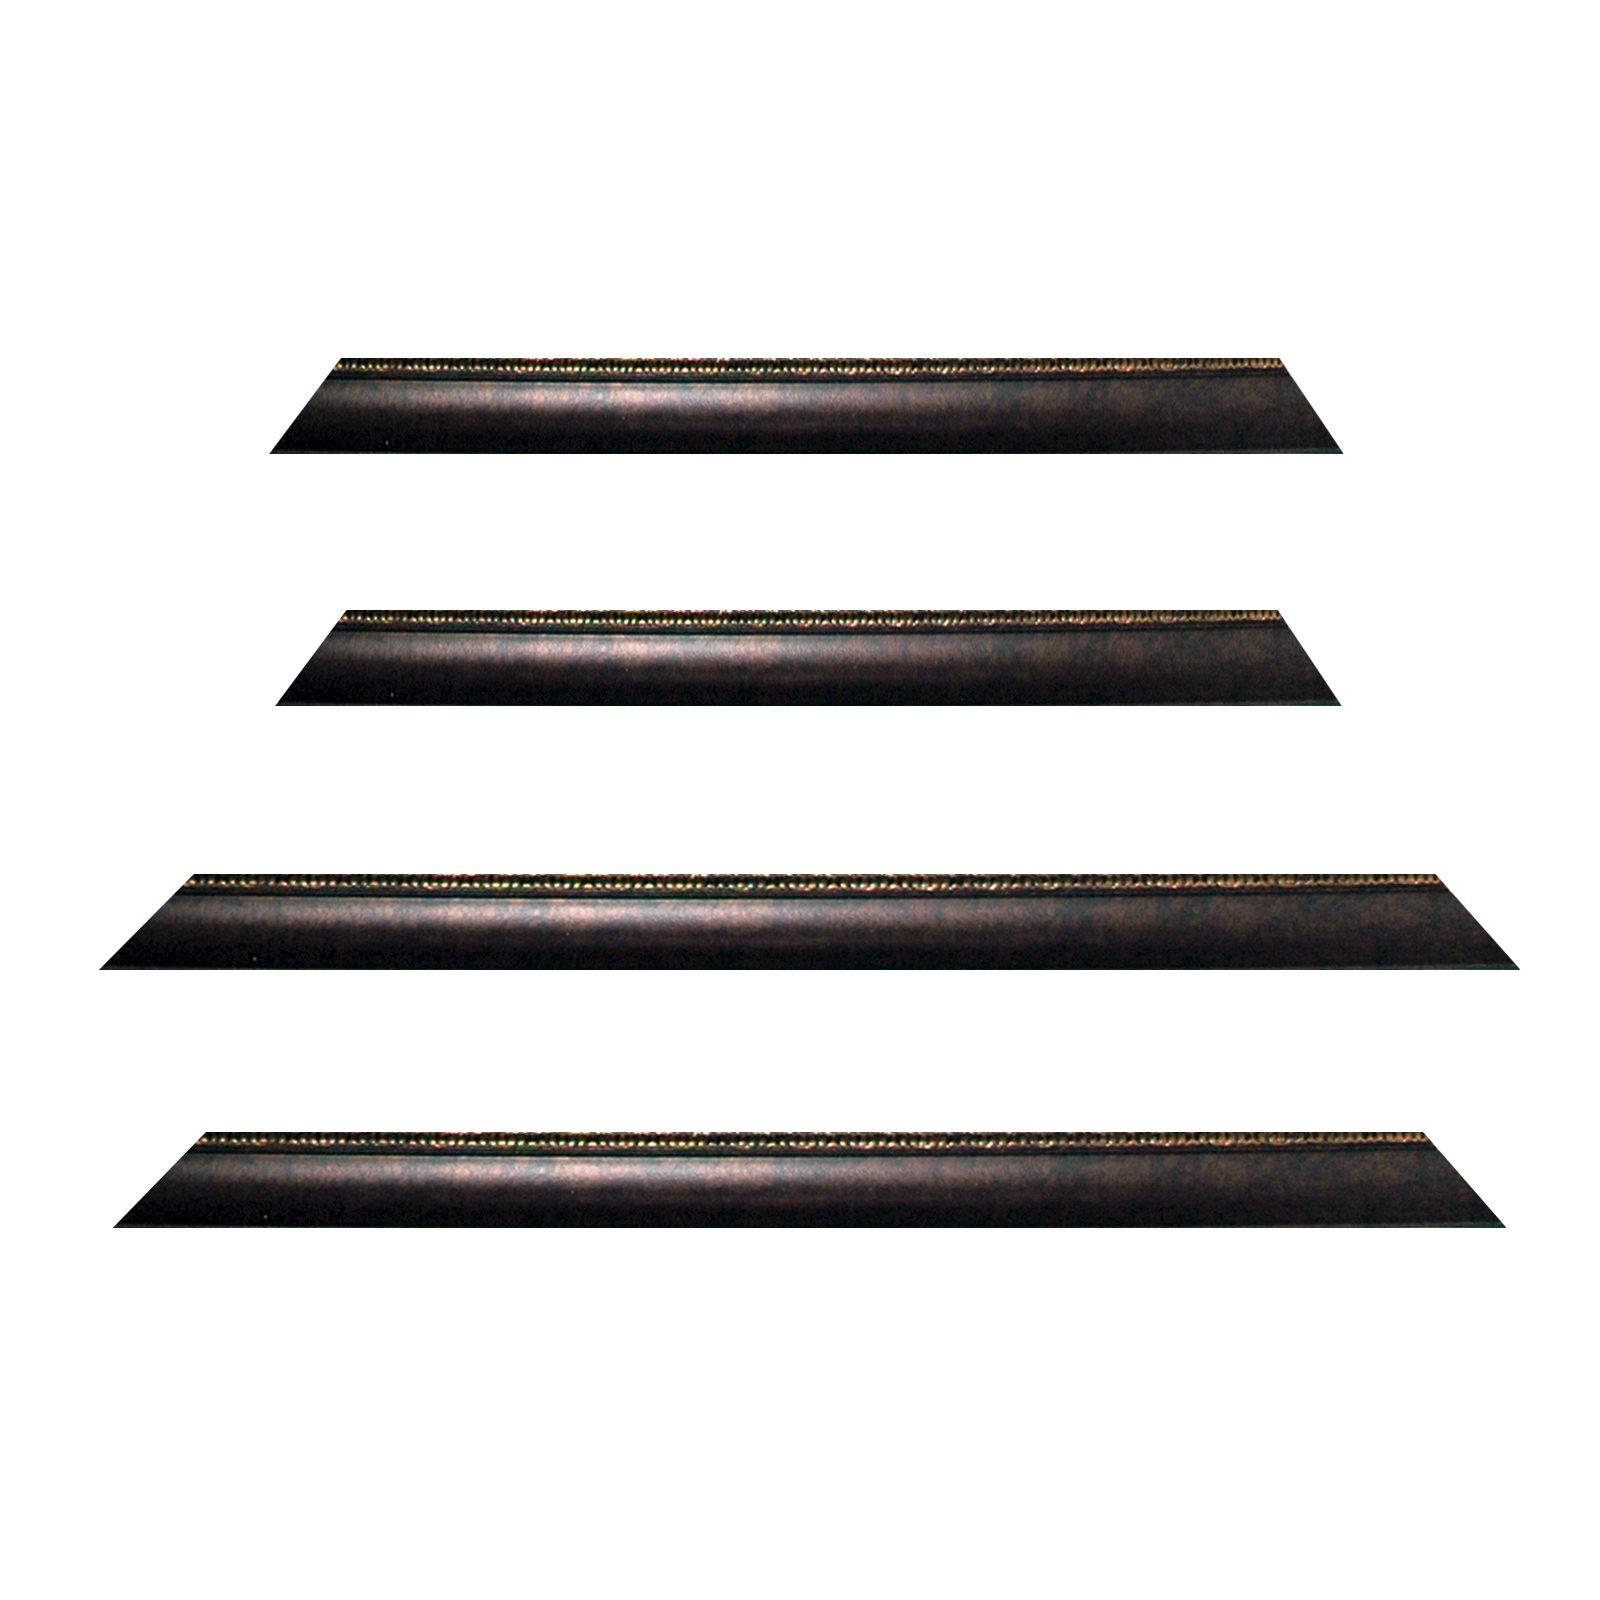 baroque brun cadre d cor finement 246 noce diff rentes variantes ebay. Black Bedroom Furniture Sets. Home Design Ideas